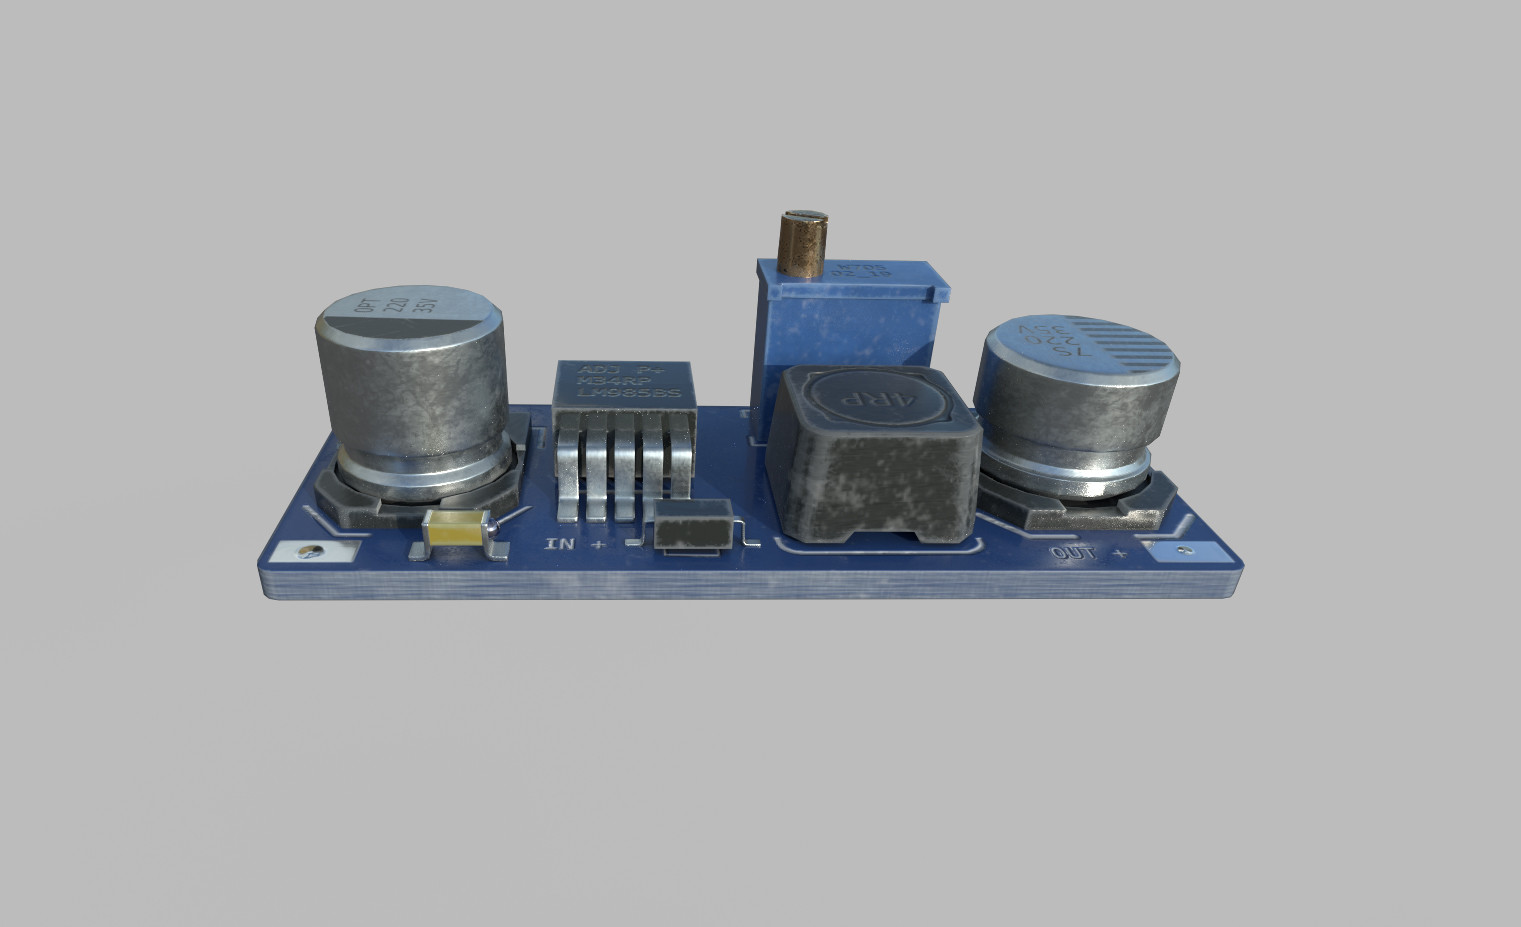 Daniel ketterman circuitboard2